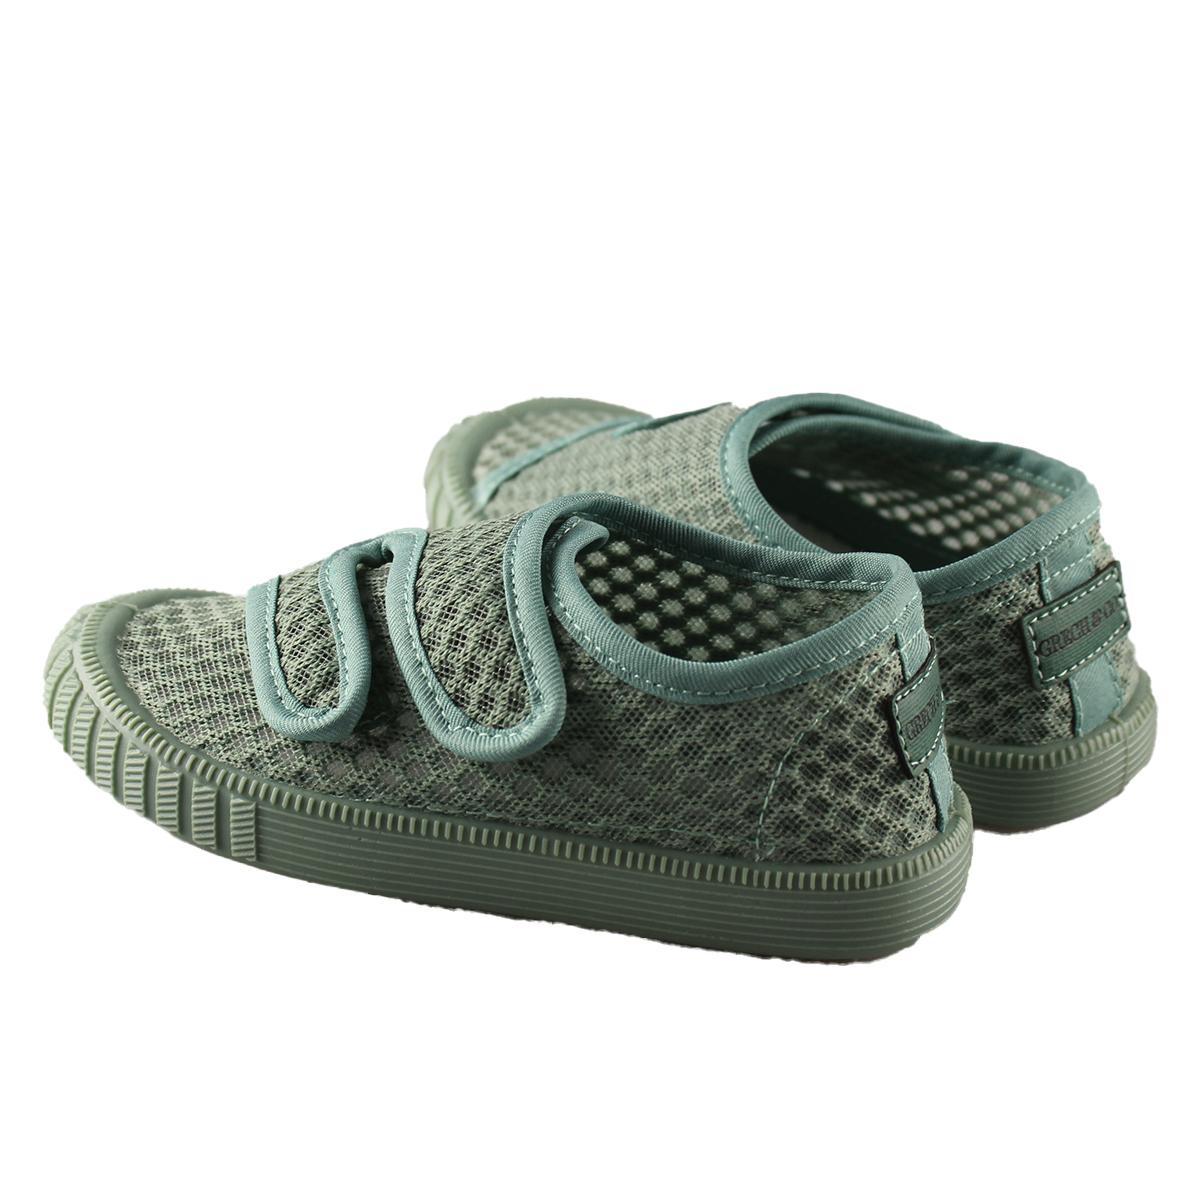 Chaussons & Chaussures Baskets Respirantes à Scratch Fern - 23 Baskets Respirantes à Scratch Fern - 23